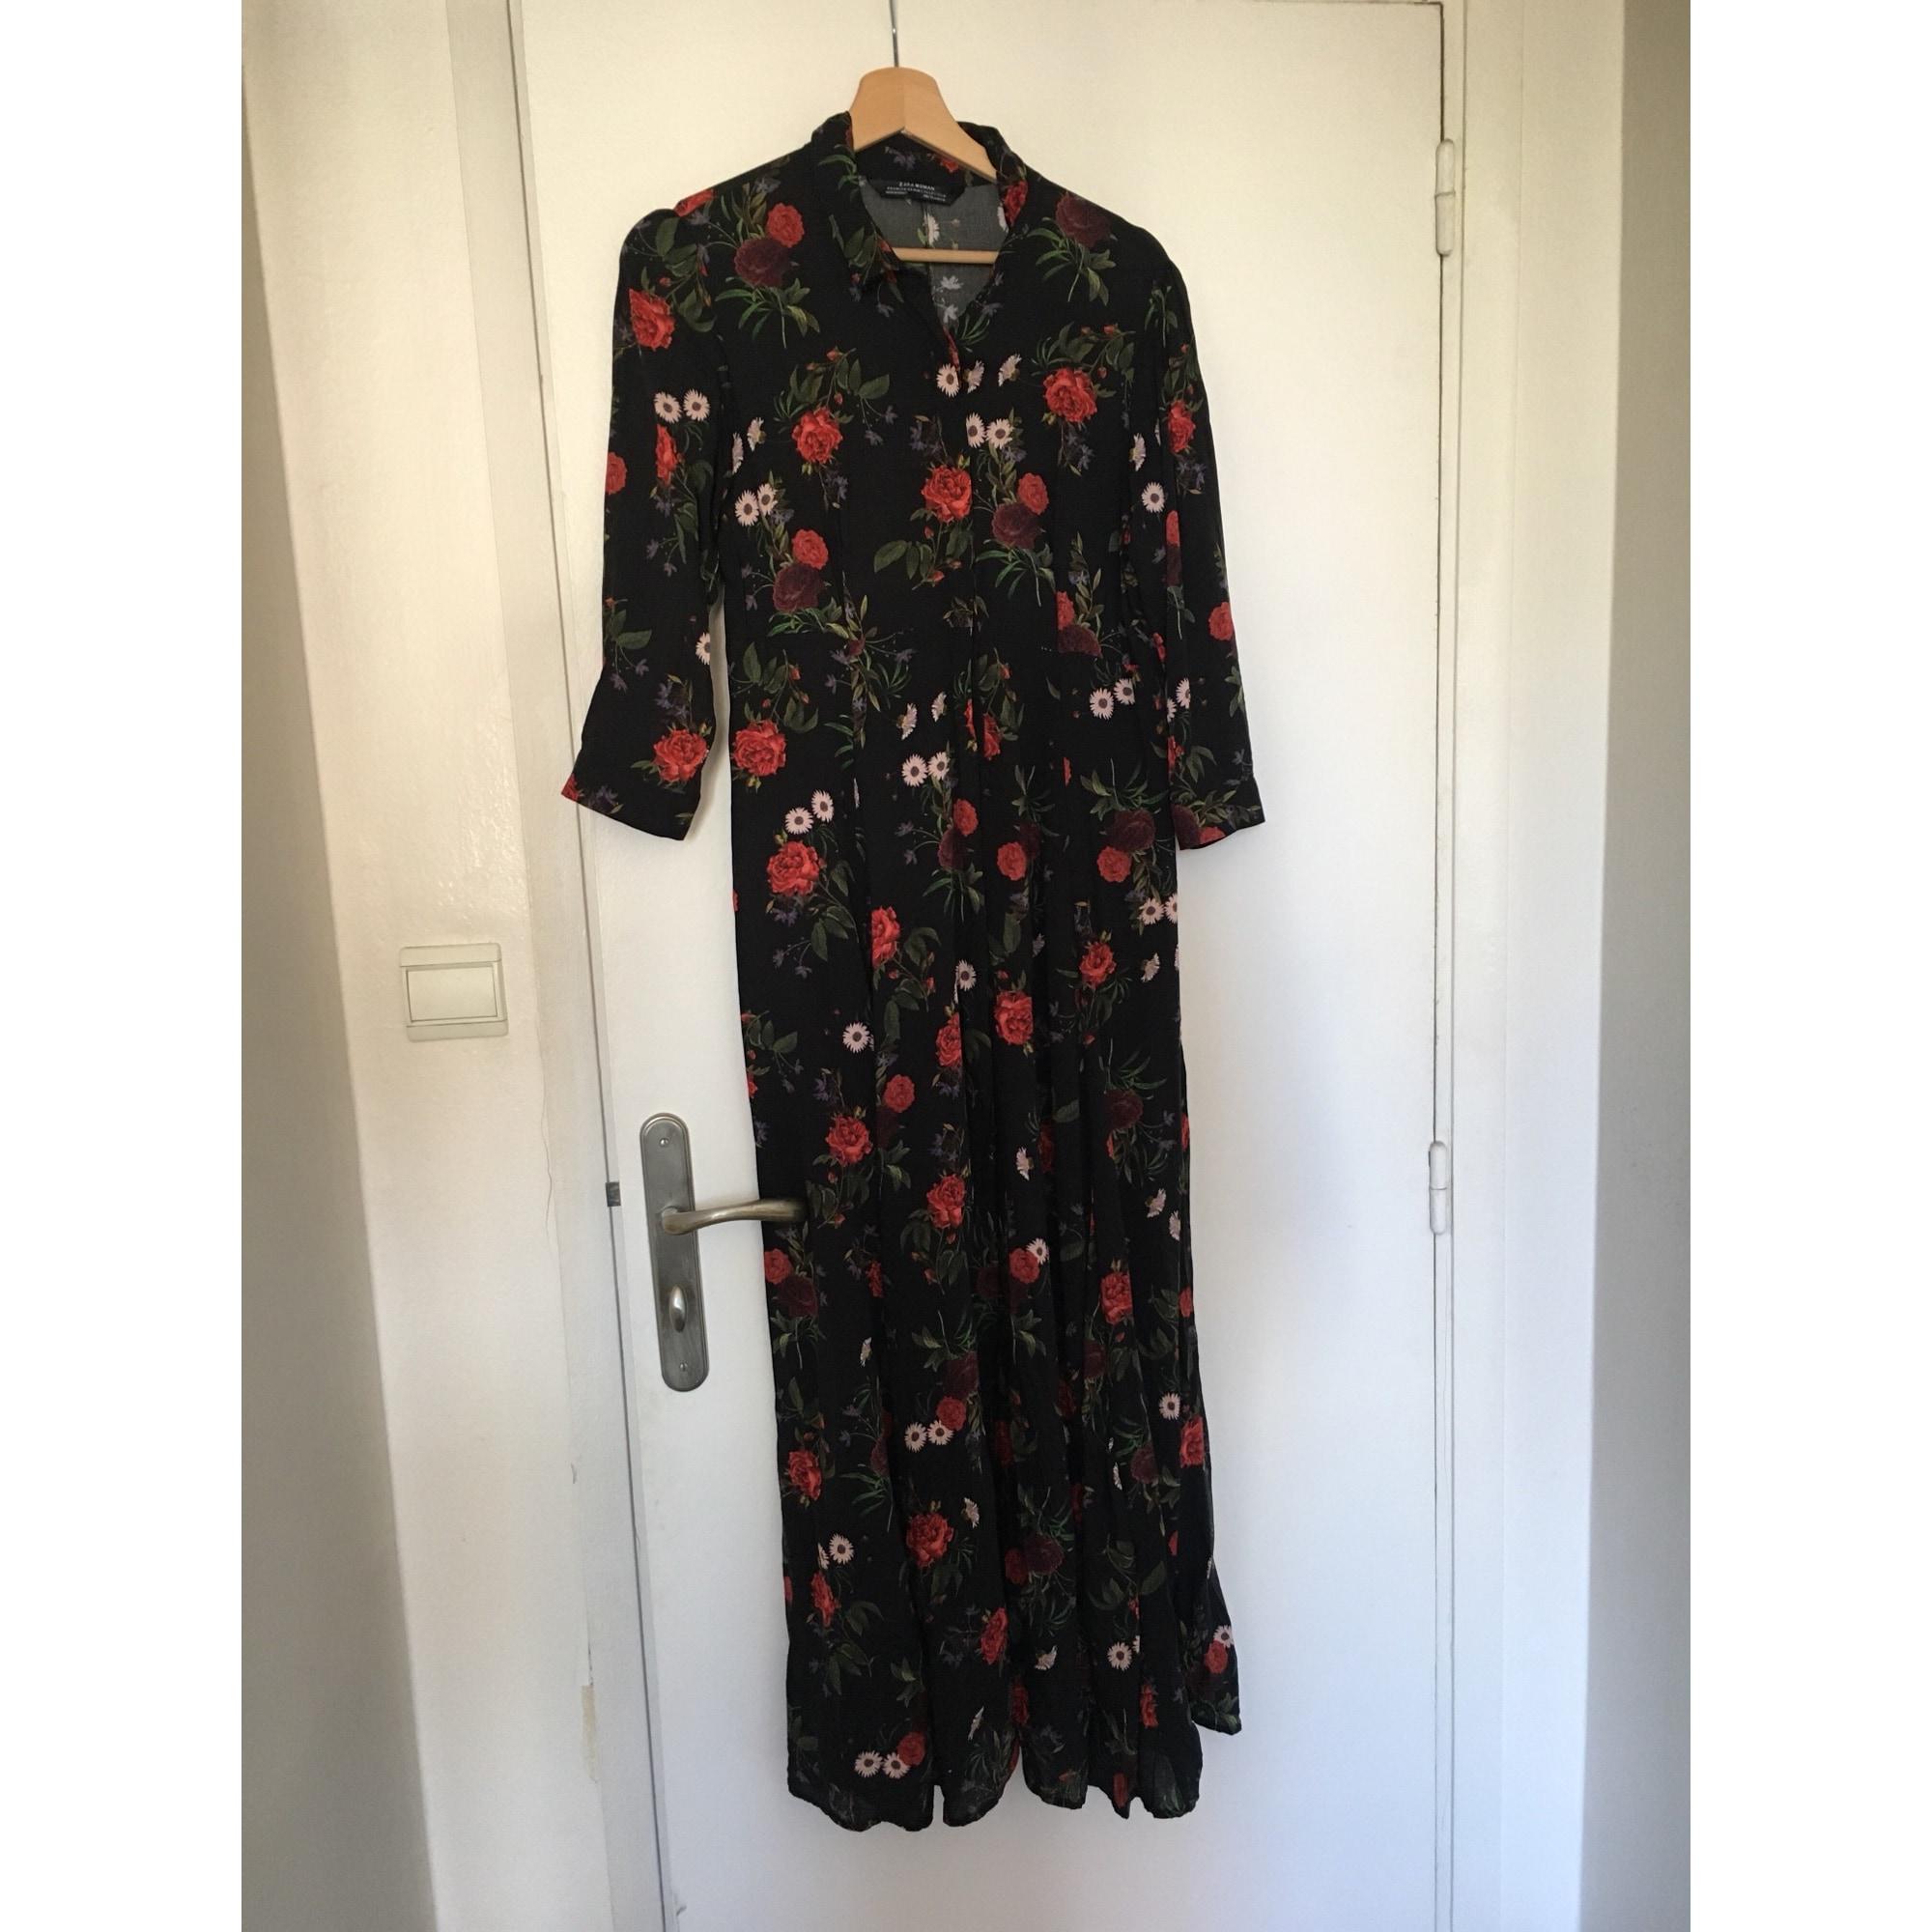 Longue Robe Zara Fleurie Fleurie Robe Rouge Longue Rouge Zara Robe vmNn80ywO